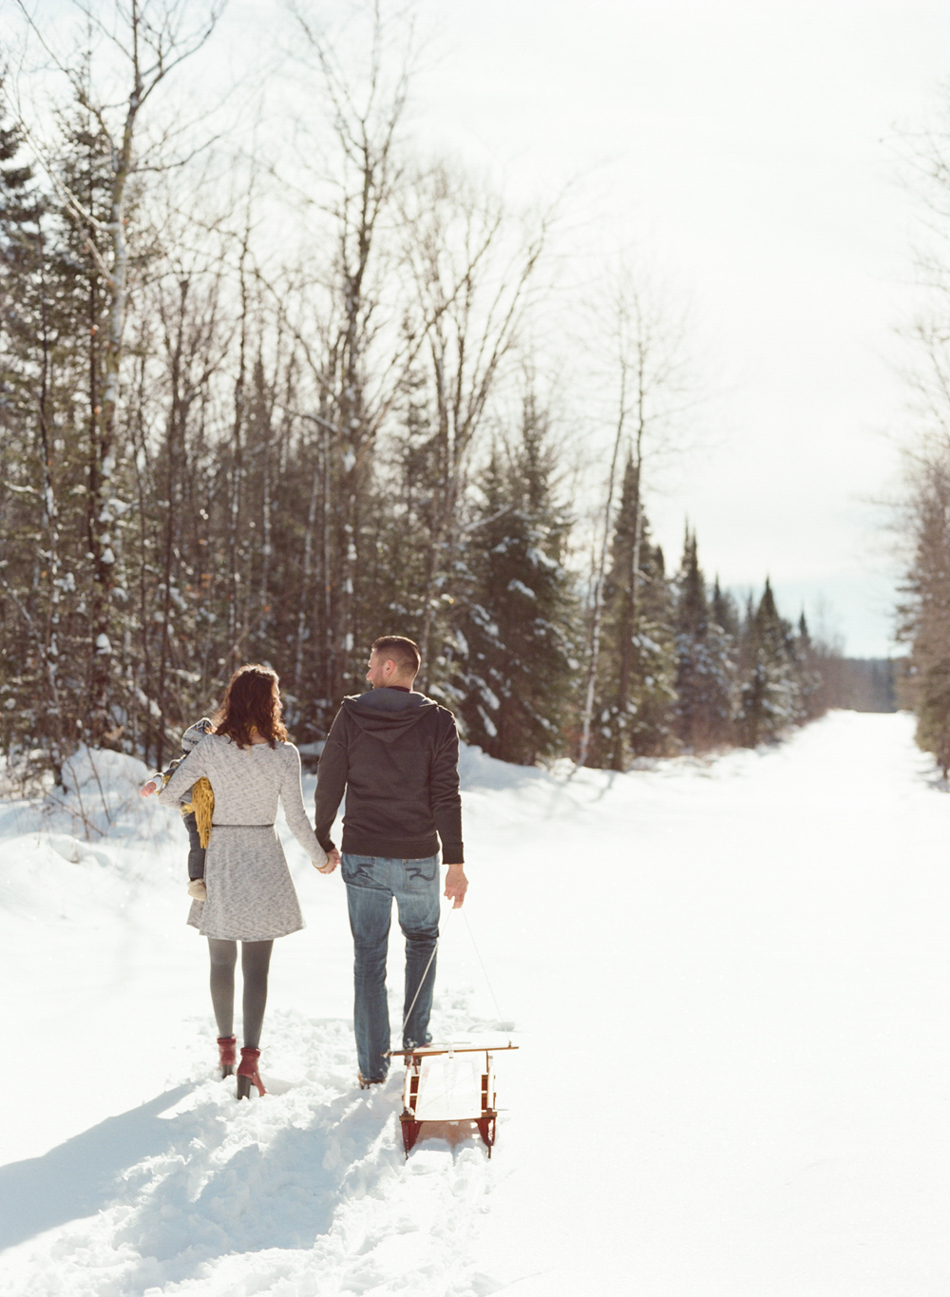 Winter_Family_Photography_Wisconsin_014.jpg